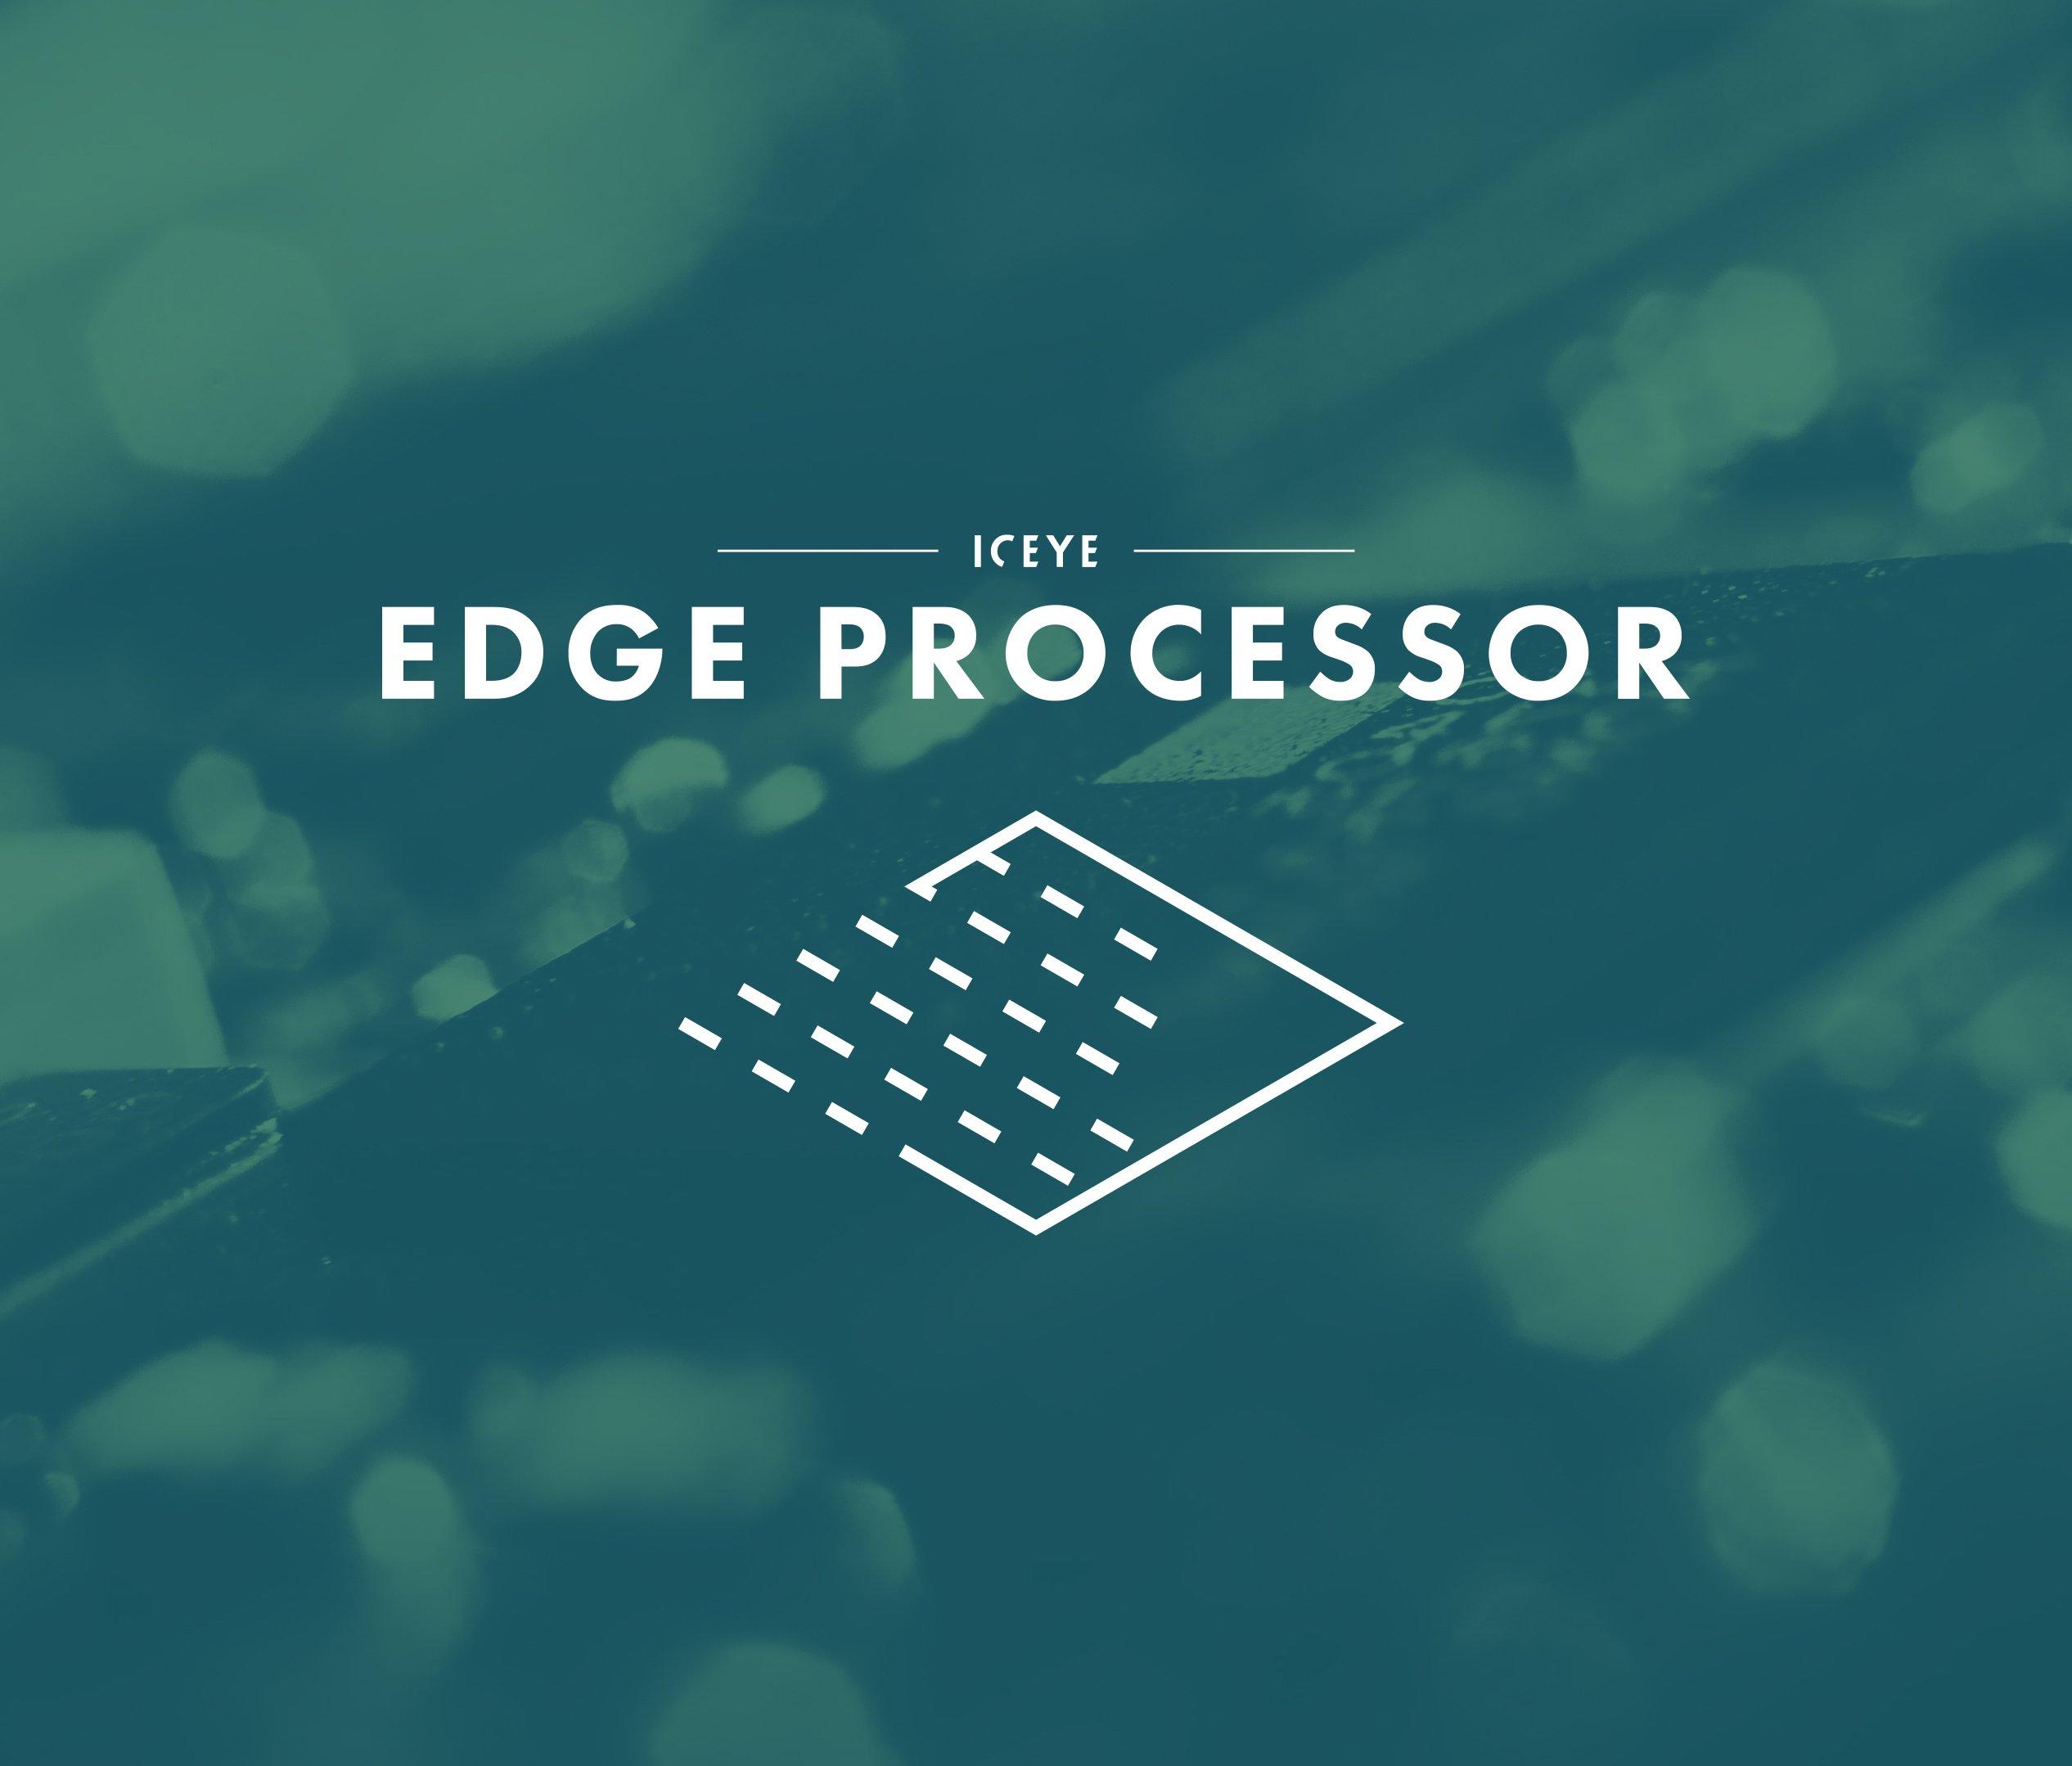 edge-processor-2